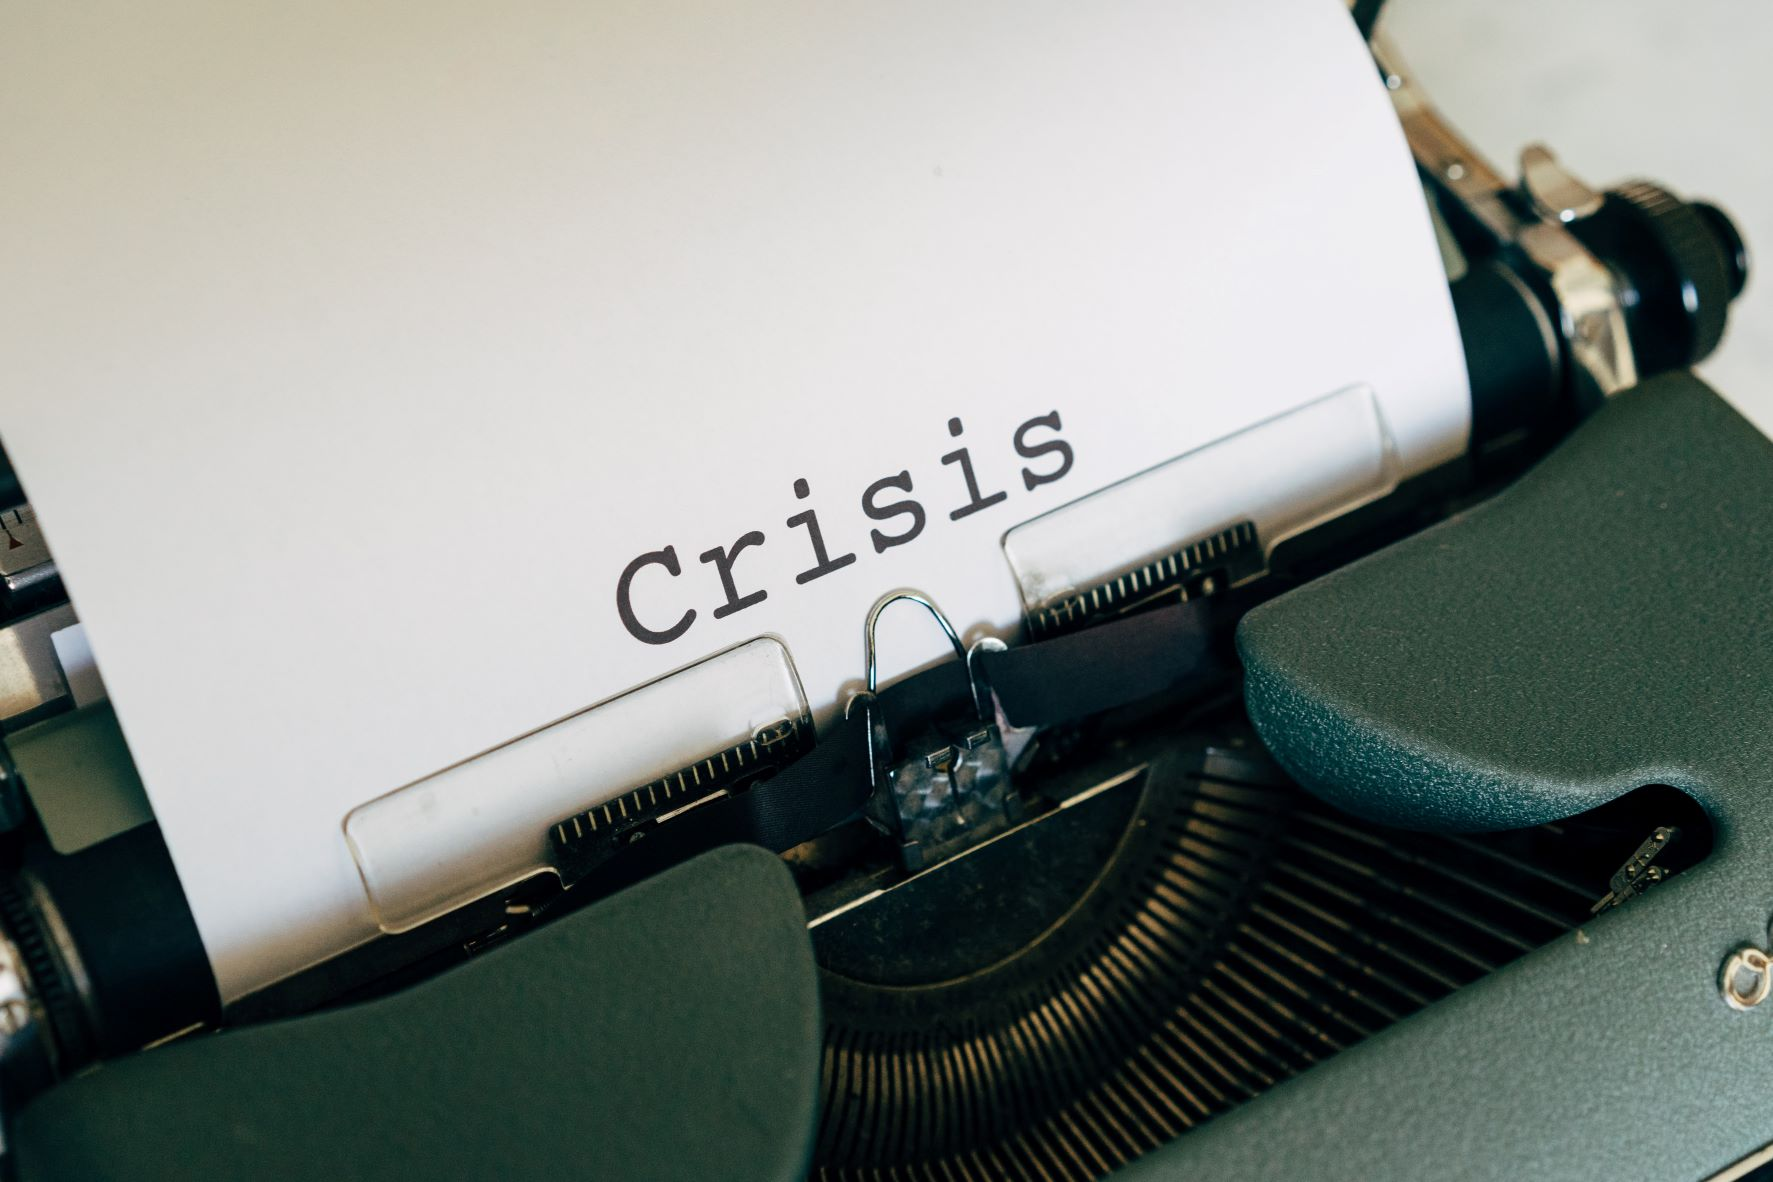 Семинар ЦБТ: Как заработать во время кризиса? - фото 1